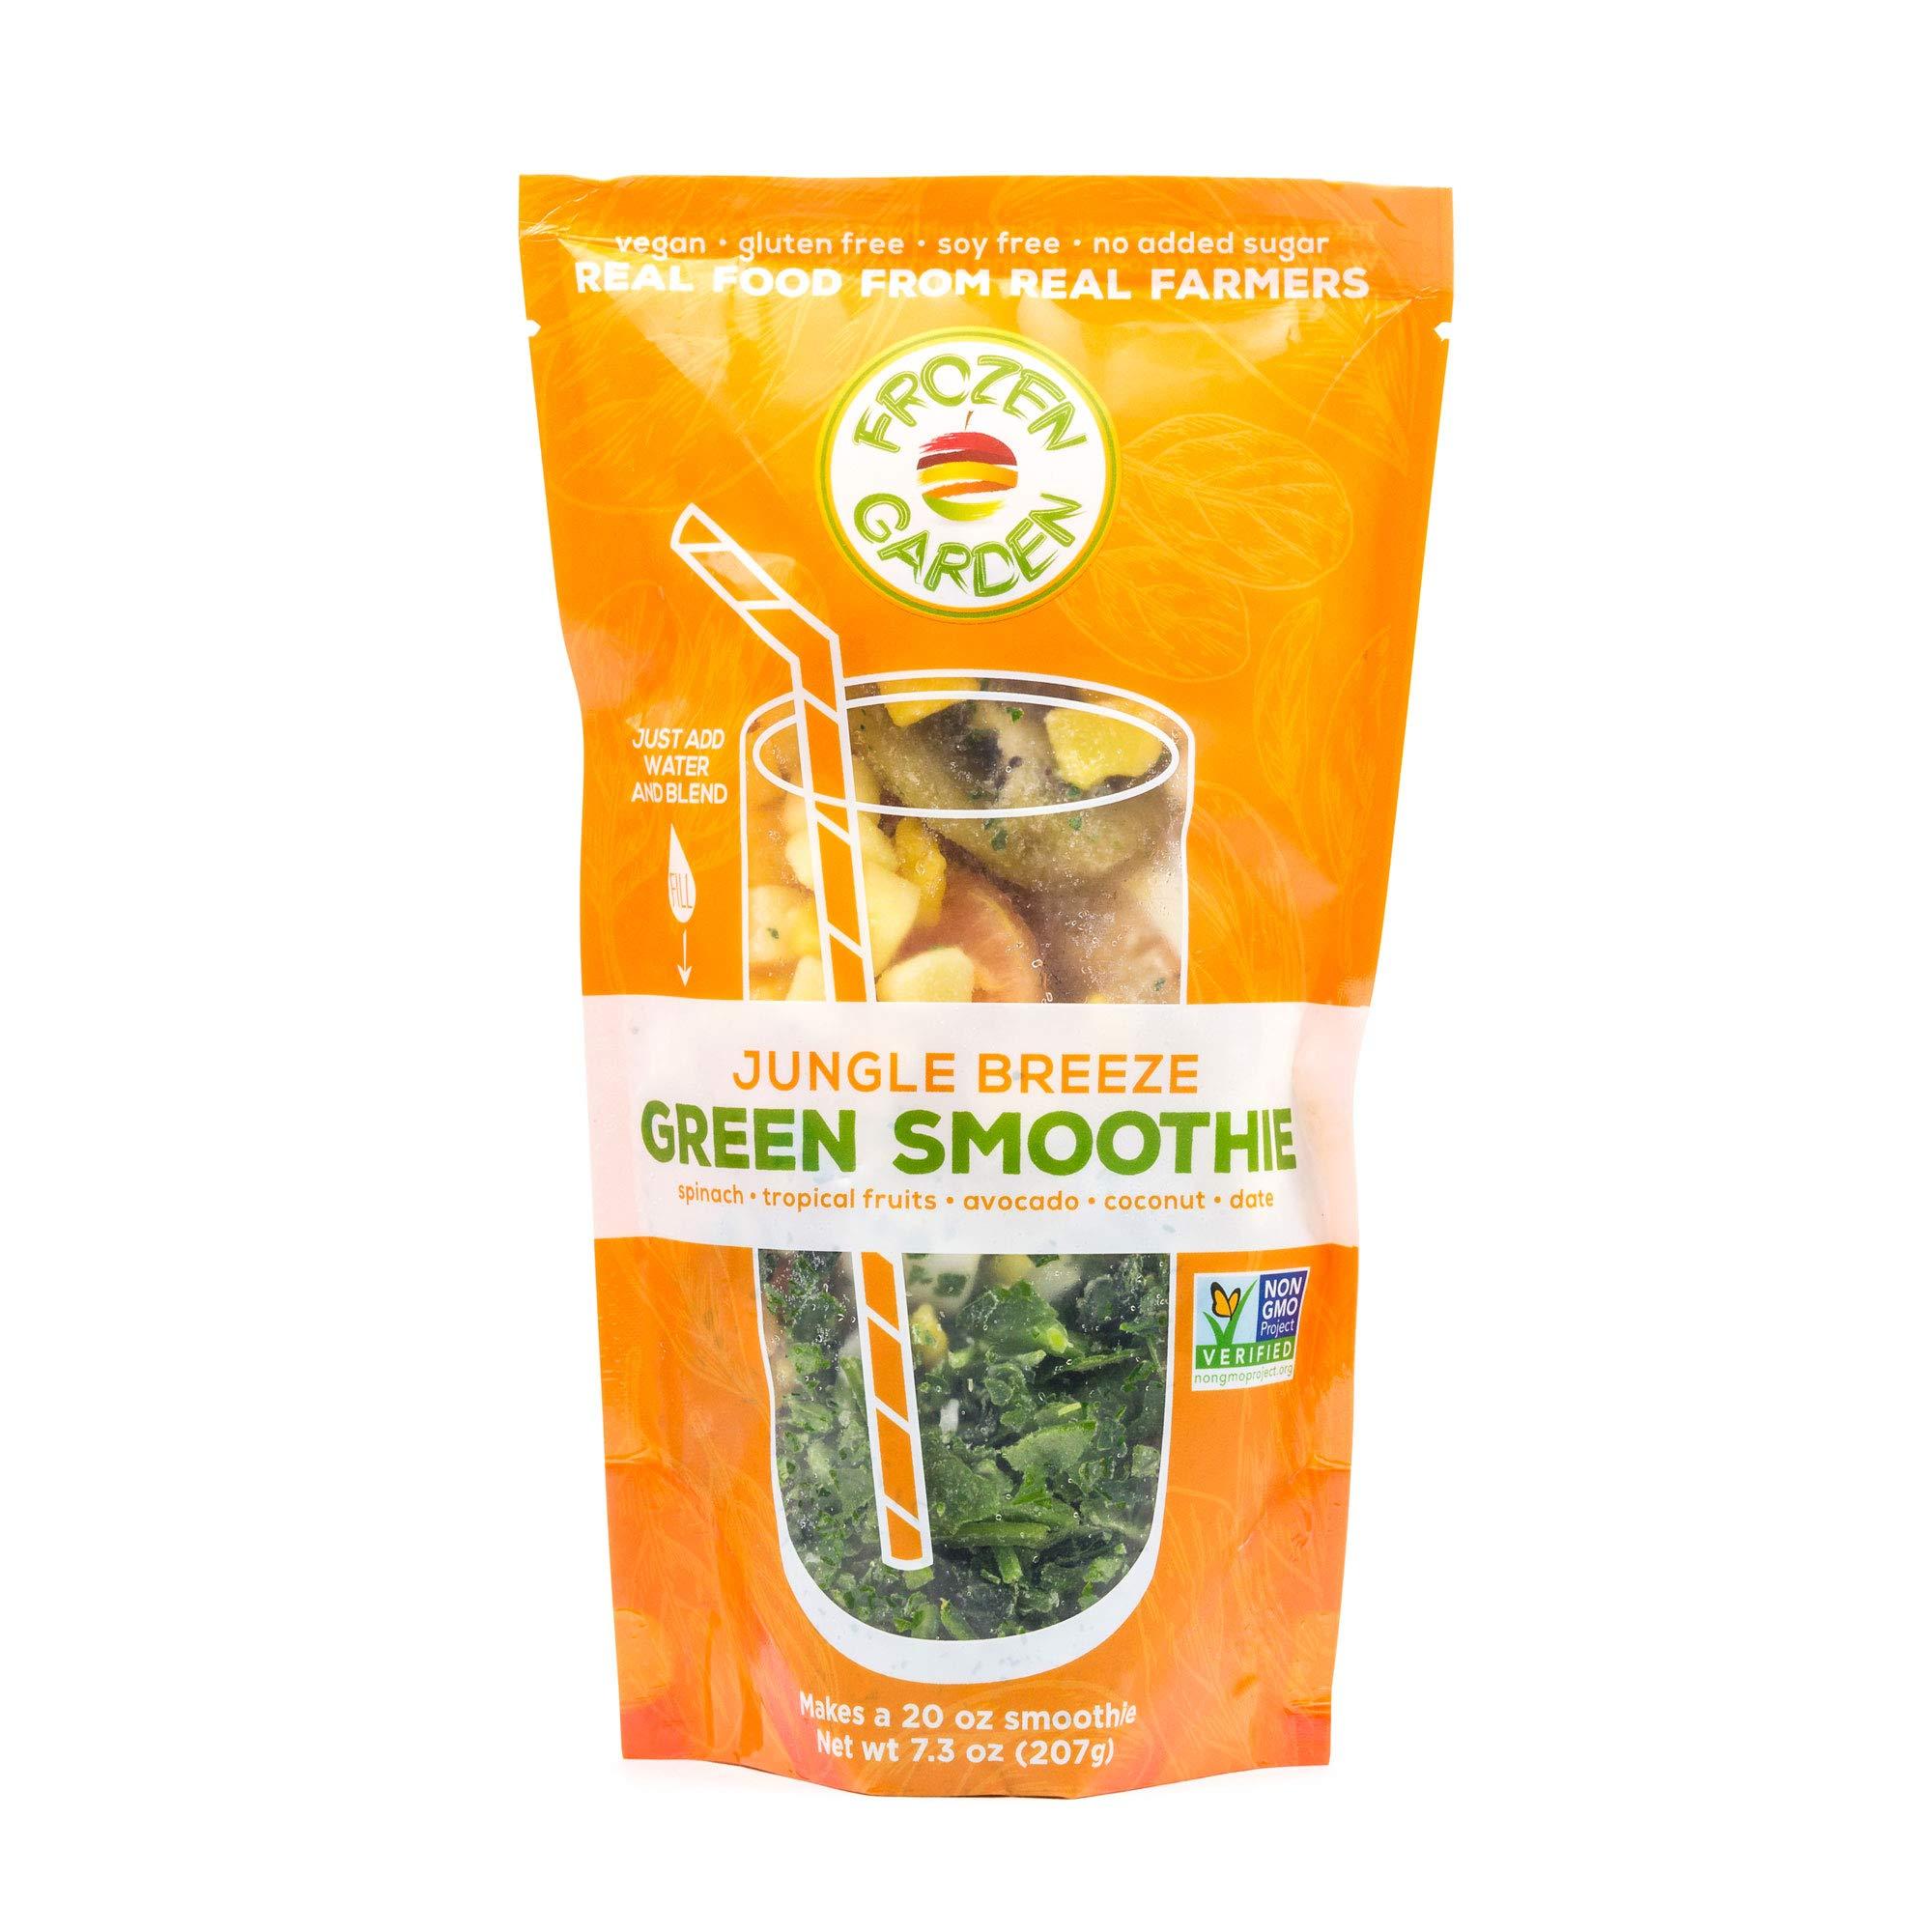 Frozen Garden Green Smoothie Pack - Jungle Breeze (16)